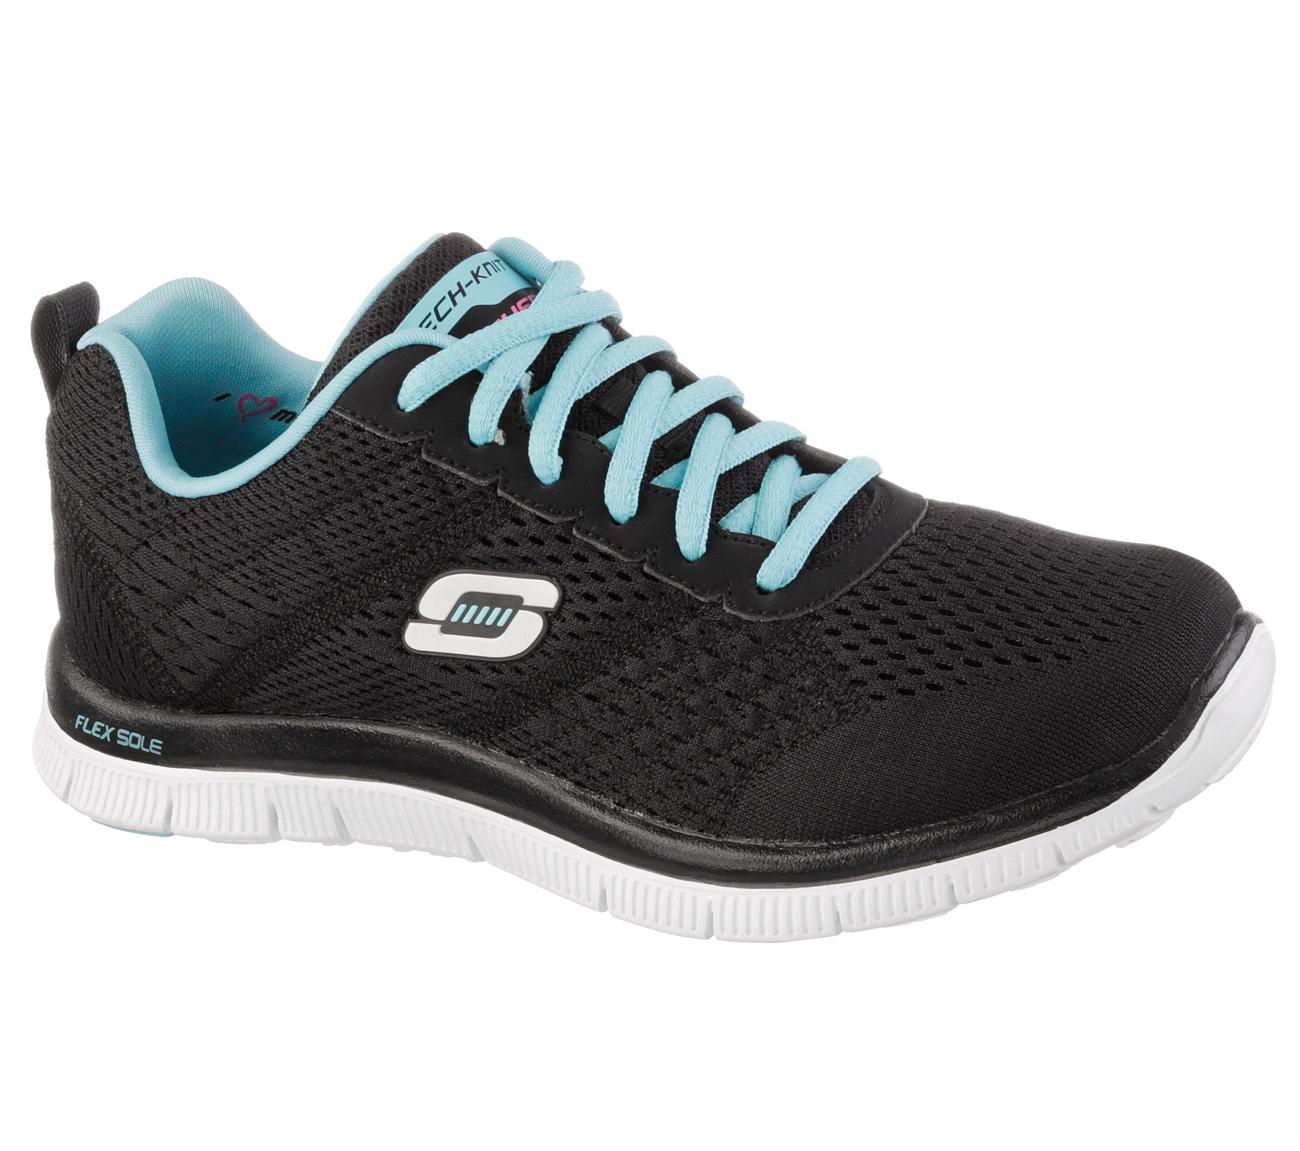 Skechers Shoes, Sandals | Zappos.com | Zappos.com